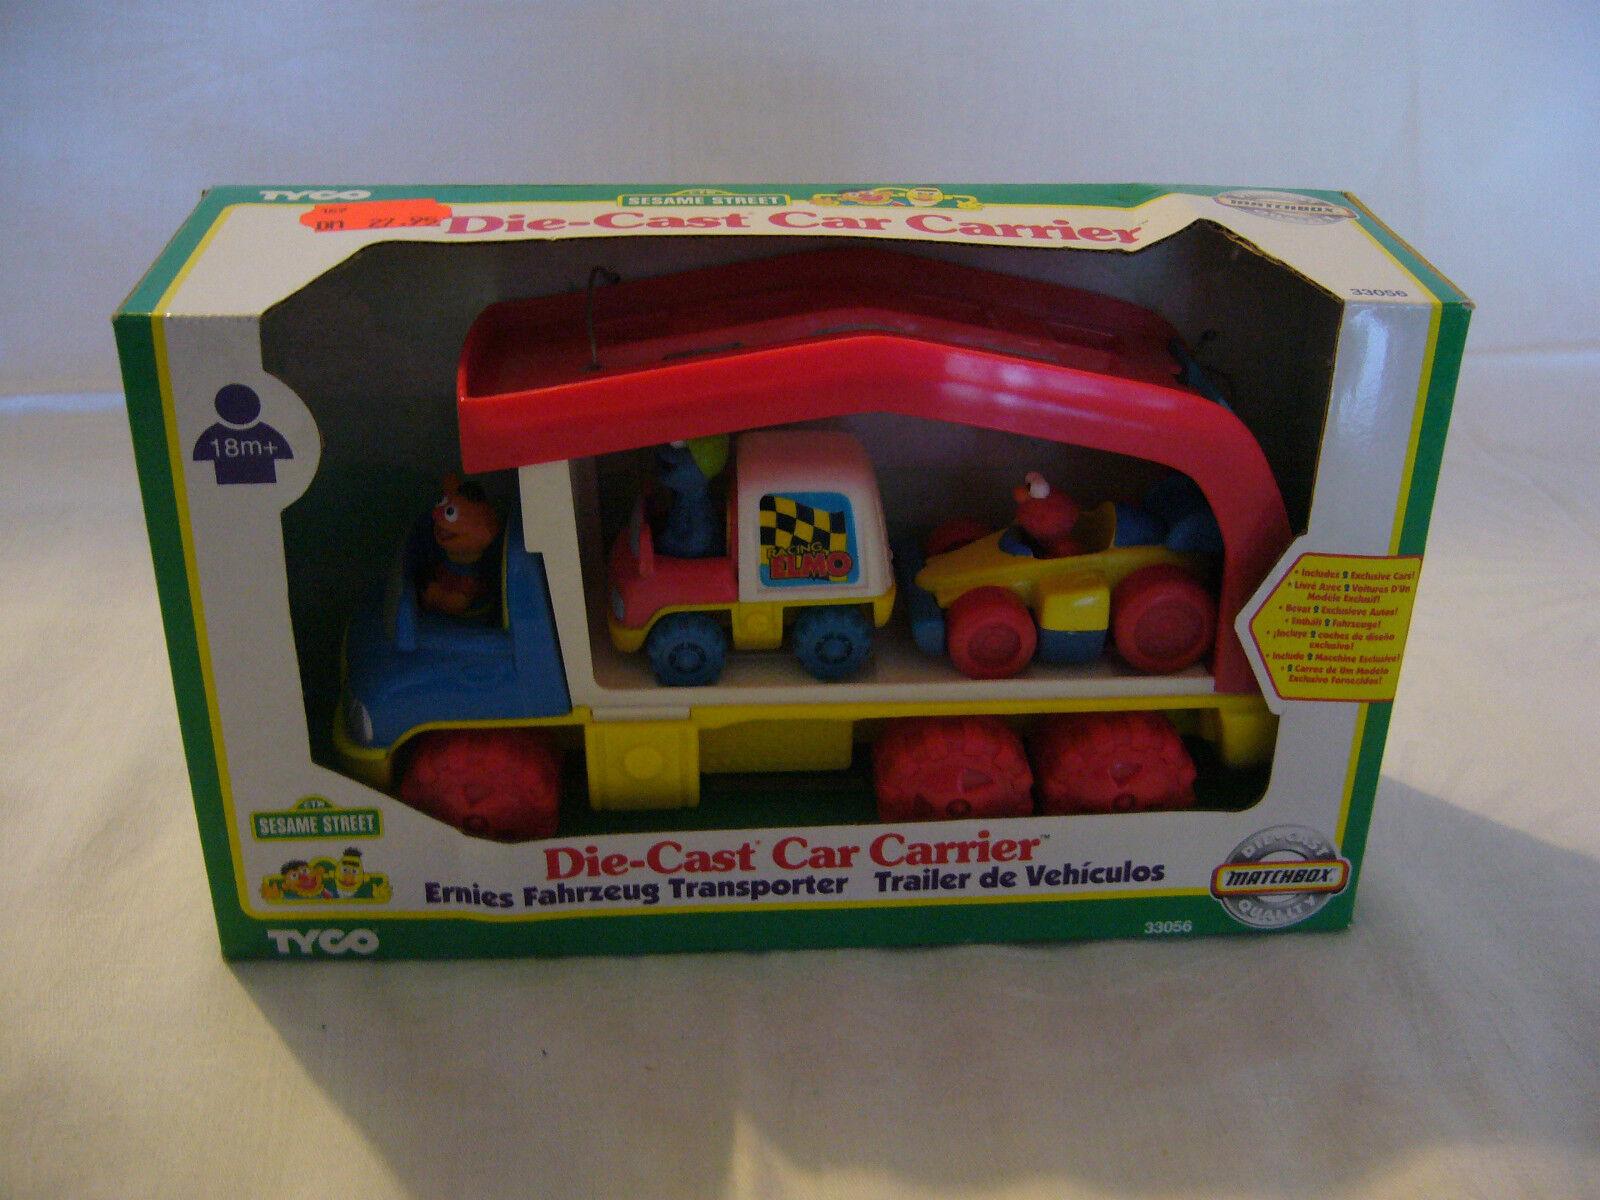 ¡envío gratis! Matchbox-la-Cast Coche Cocherier-sesame street -1997 tyco-ernies vehículo de transporte transporte transporte  Ven a elegir tu propio estilo deportivo.